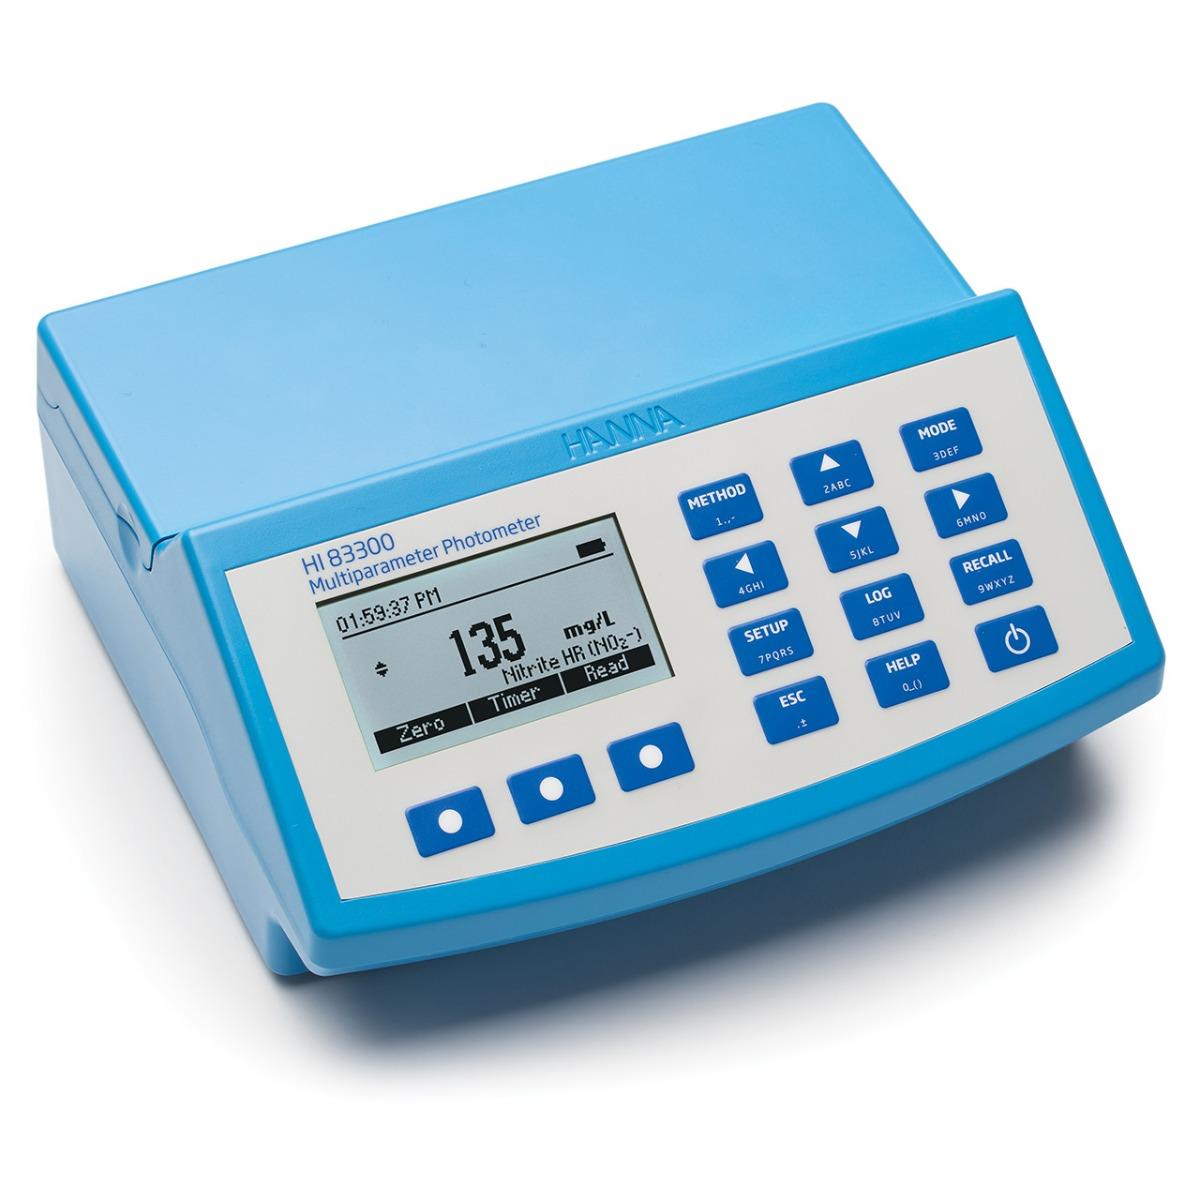 HI83300 Advanced Multiparameter Benchtop Photometer and pH meter